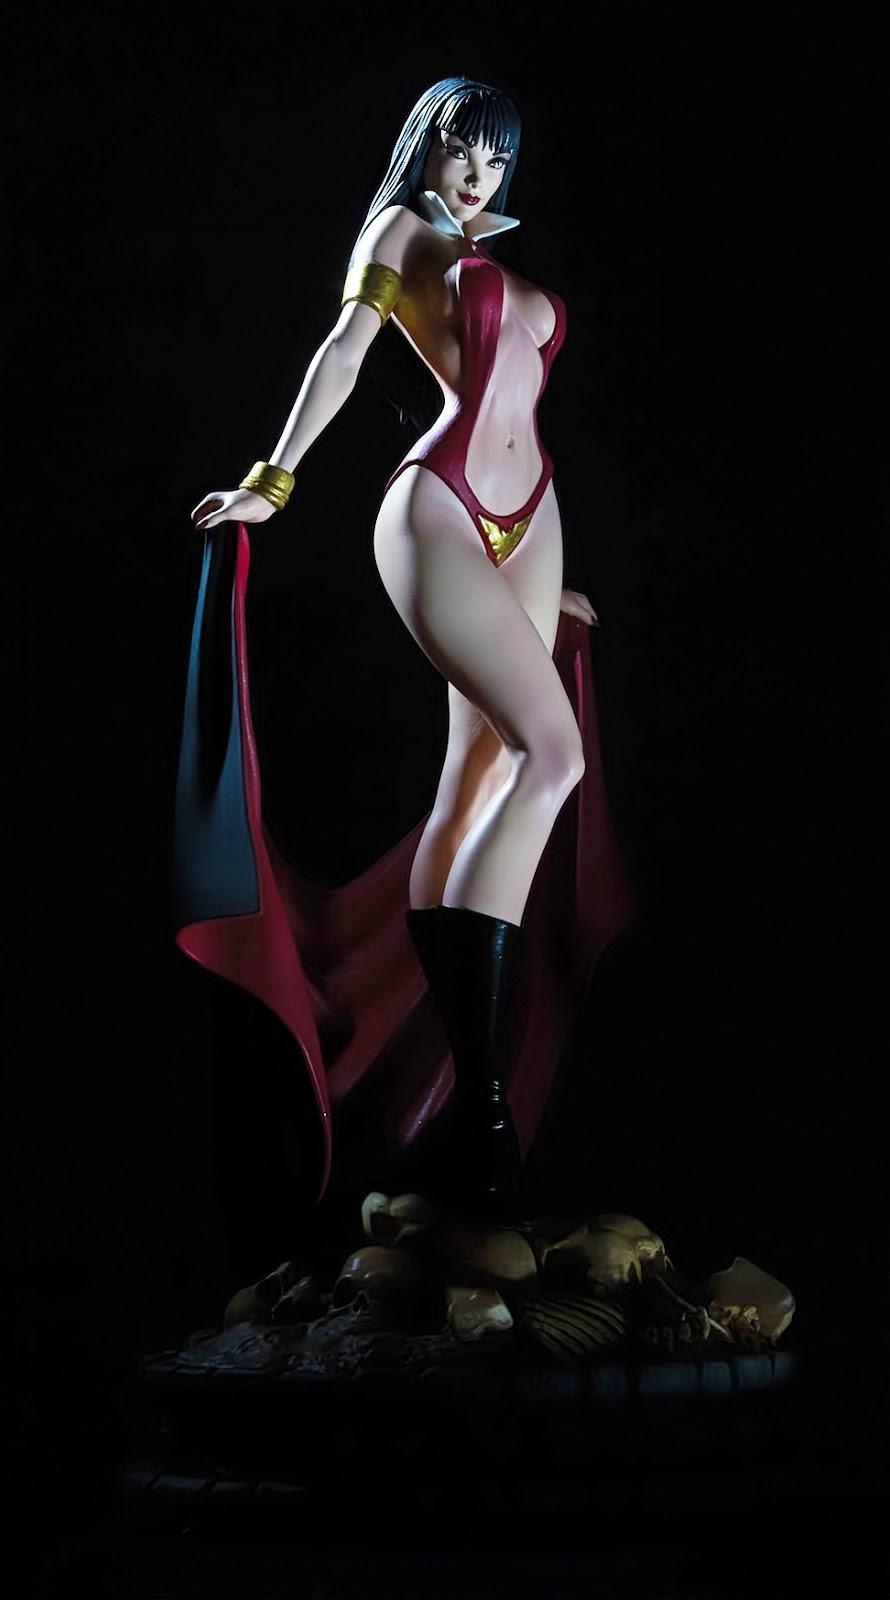 [Dynamite] Woman of Dynamite: Vampirella Statue Vamp_1_dark